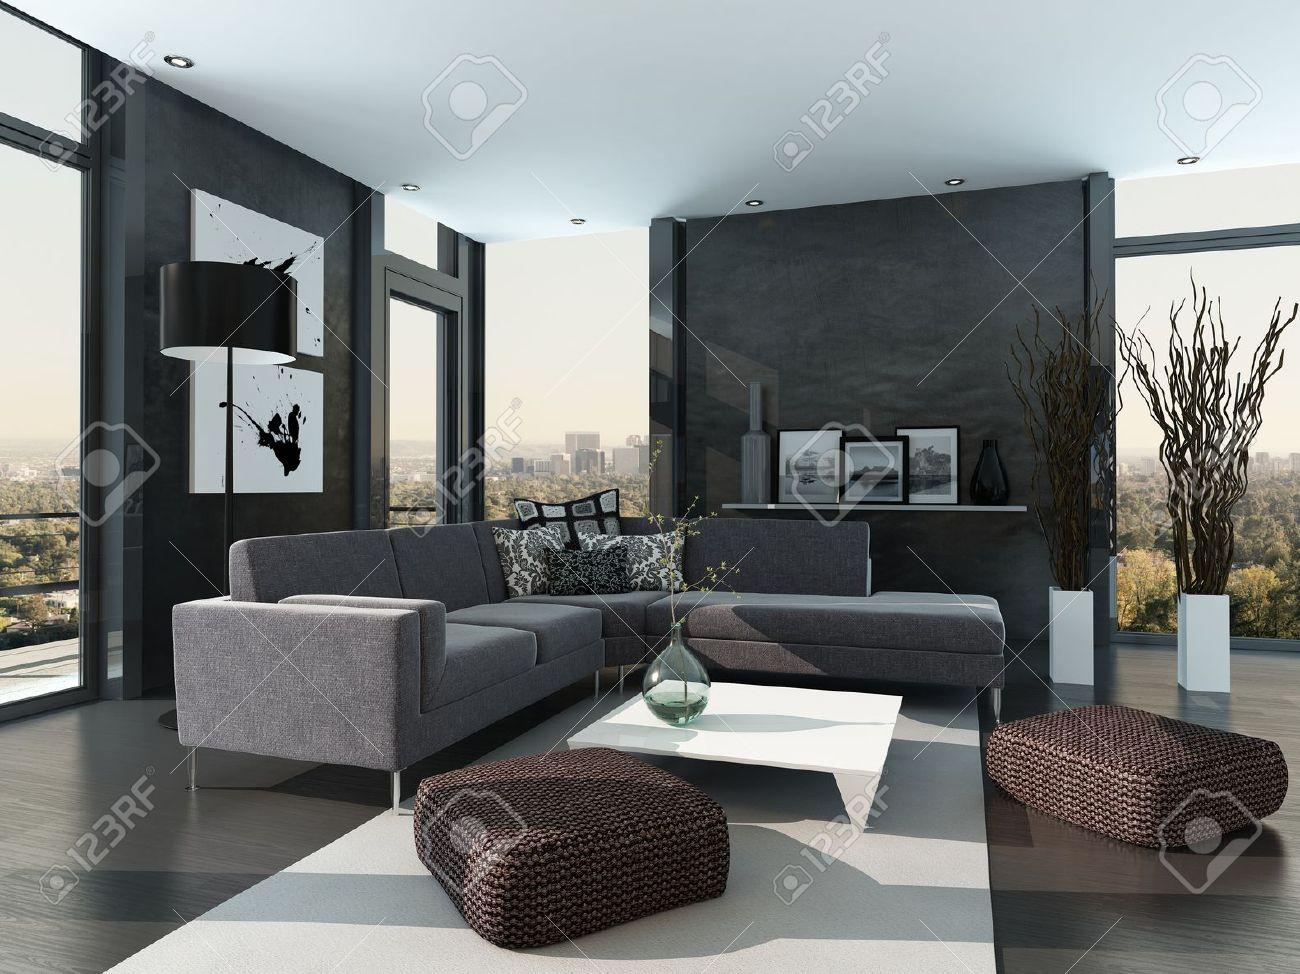 Grijs gekleurde modern design woonkamer interieur royalty vrije ...